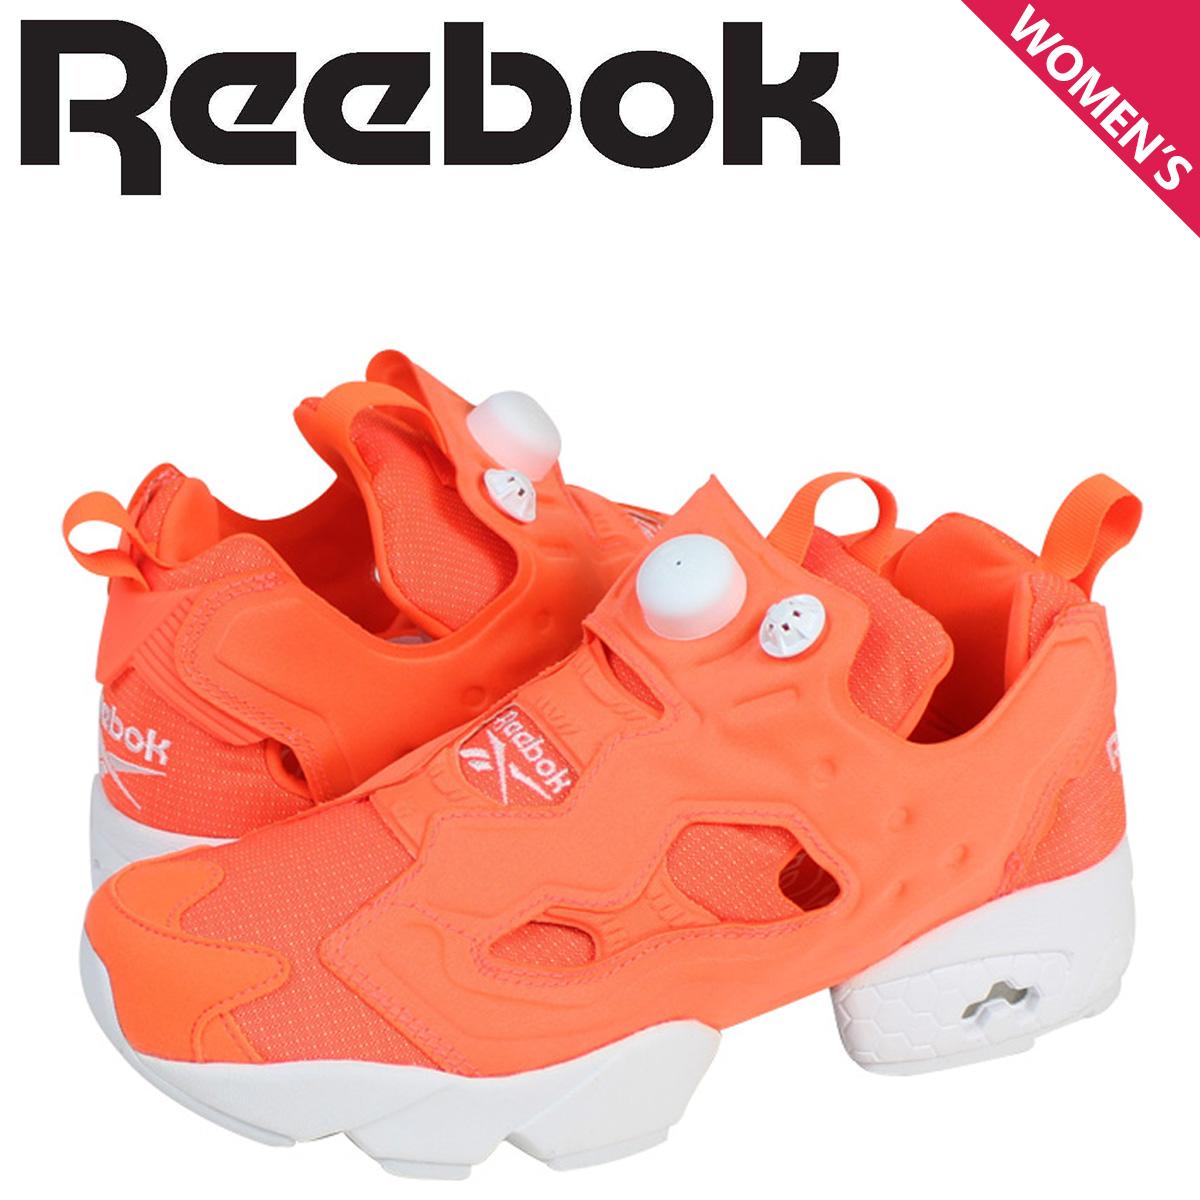 Reebok リーボック ポンプフューリー スニーカー INSTAPUMP FURY TECH M46319 メンズ レディース 靴 オレンジ